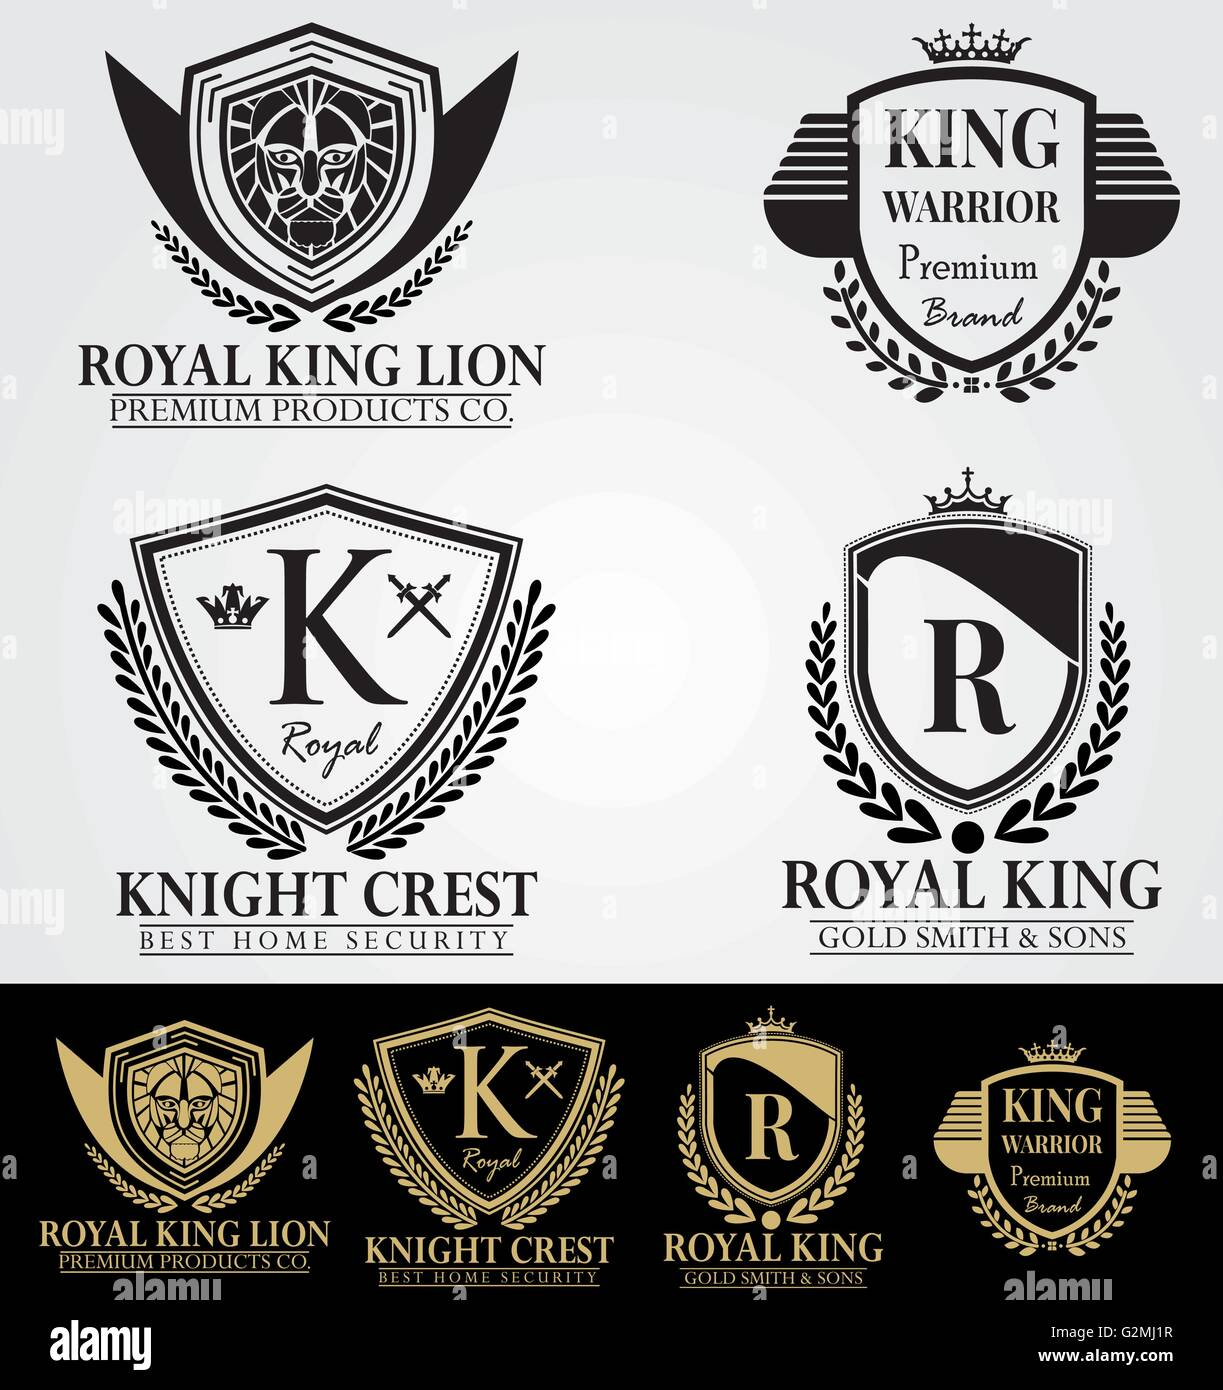 Royal Heraldic Elegant Logo Collection – Vintage coat of arms – Fashion & Elegant company logotypes. - Stock Image